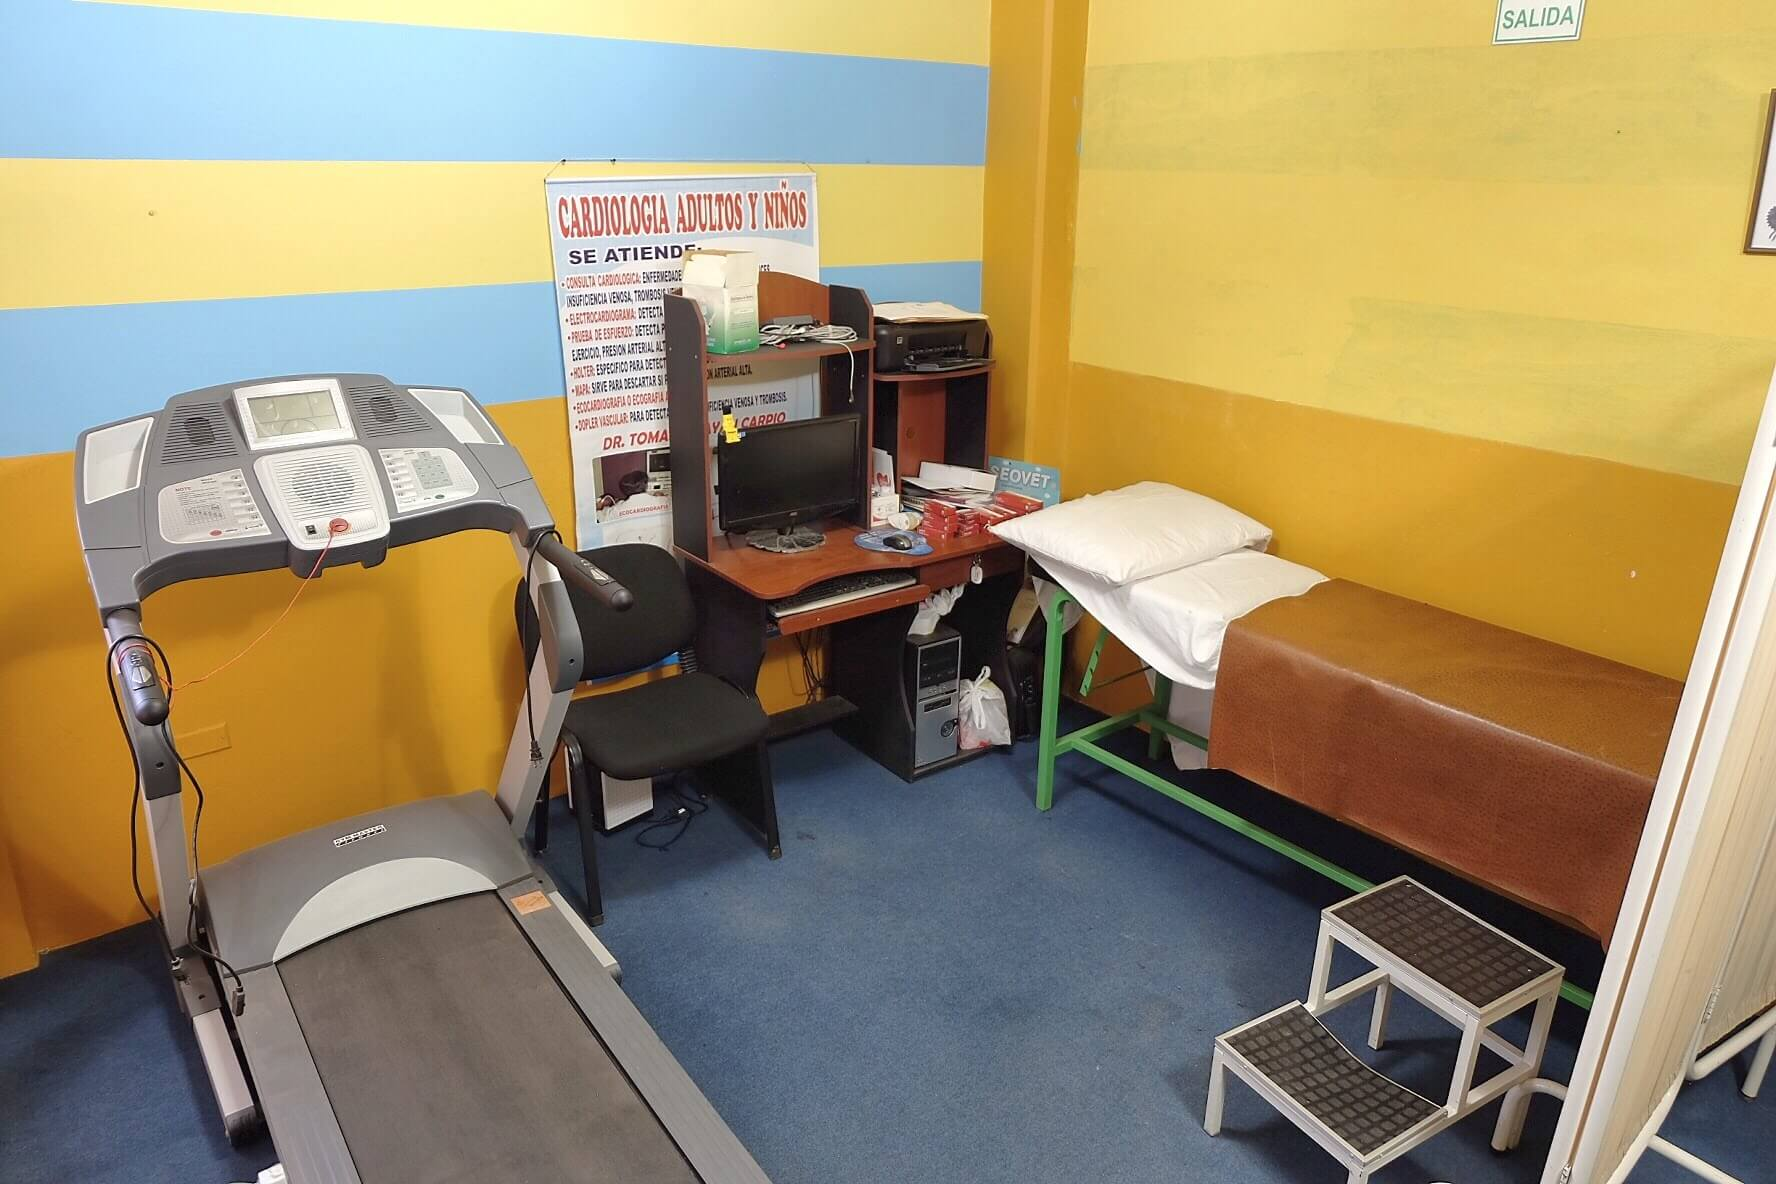 MEDICENTRO TOURIST'S HEALTH